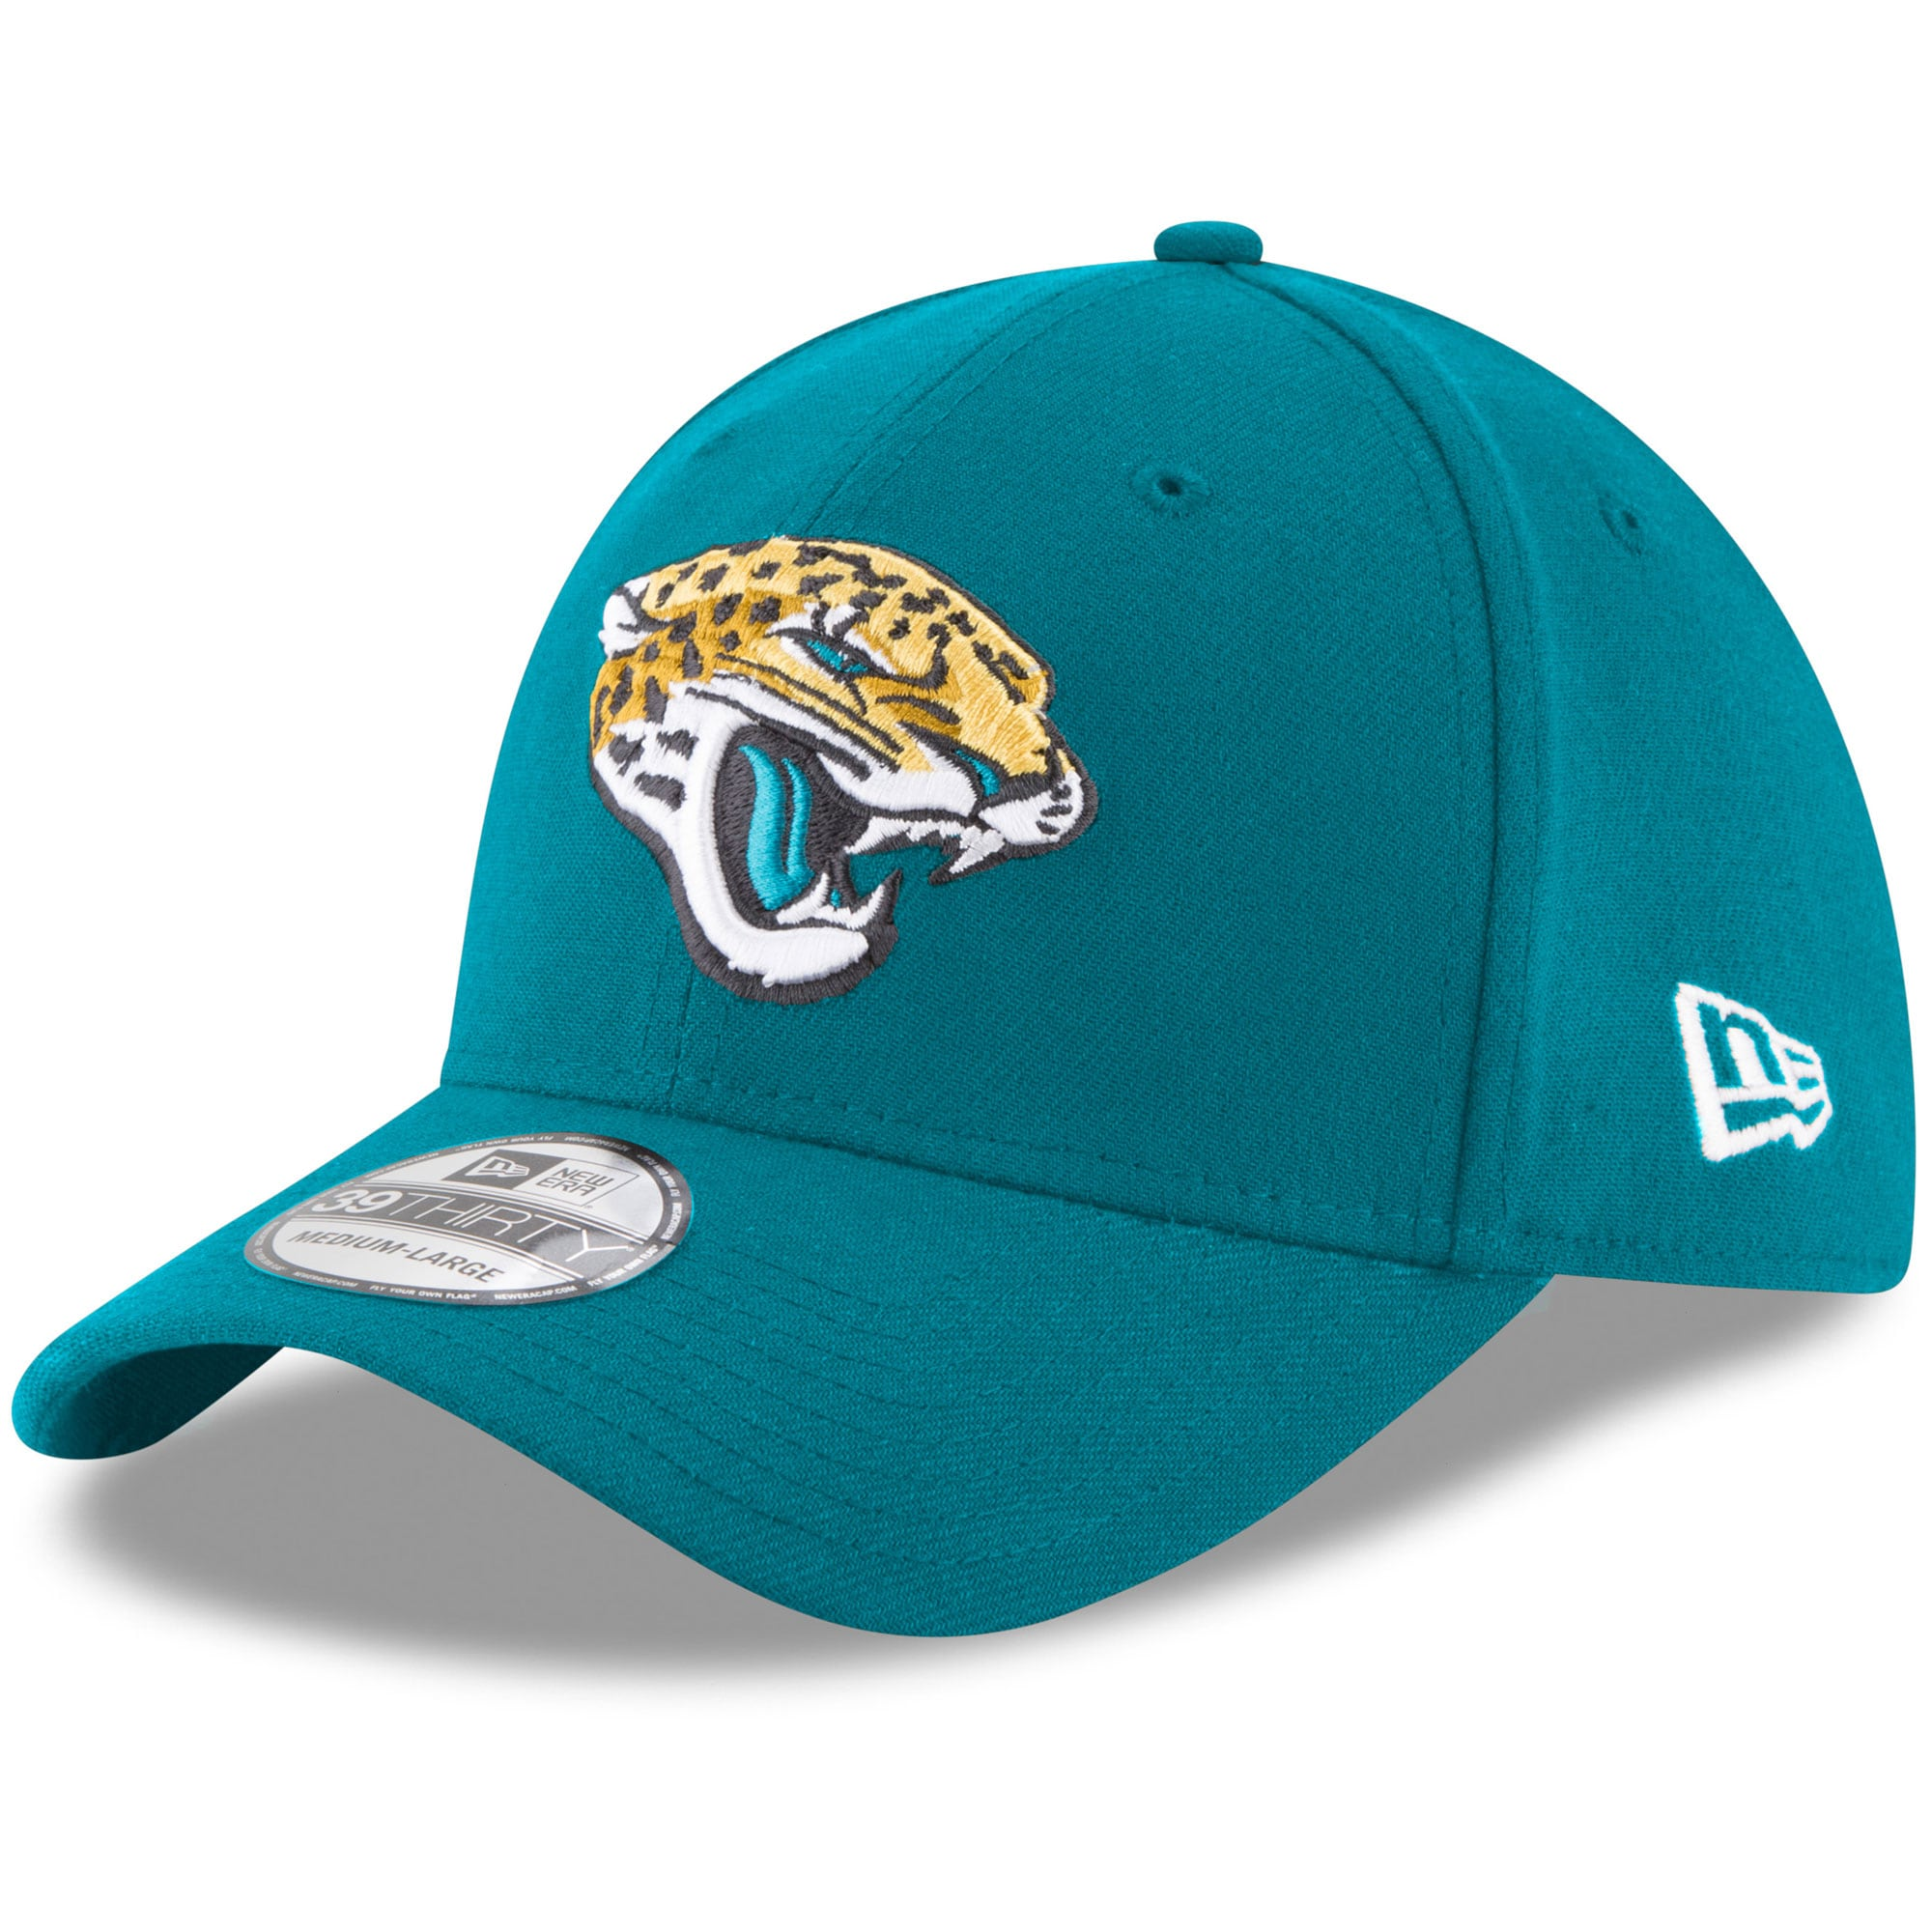 Jacksonville Jaguars New Era 39THIRTY Flex Team Classic Hat - Teal